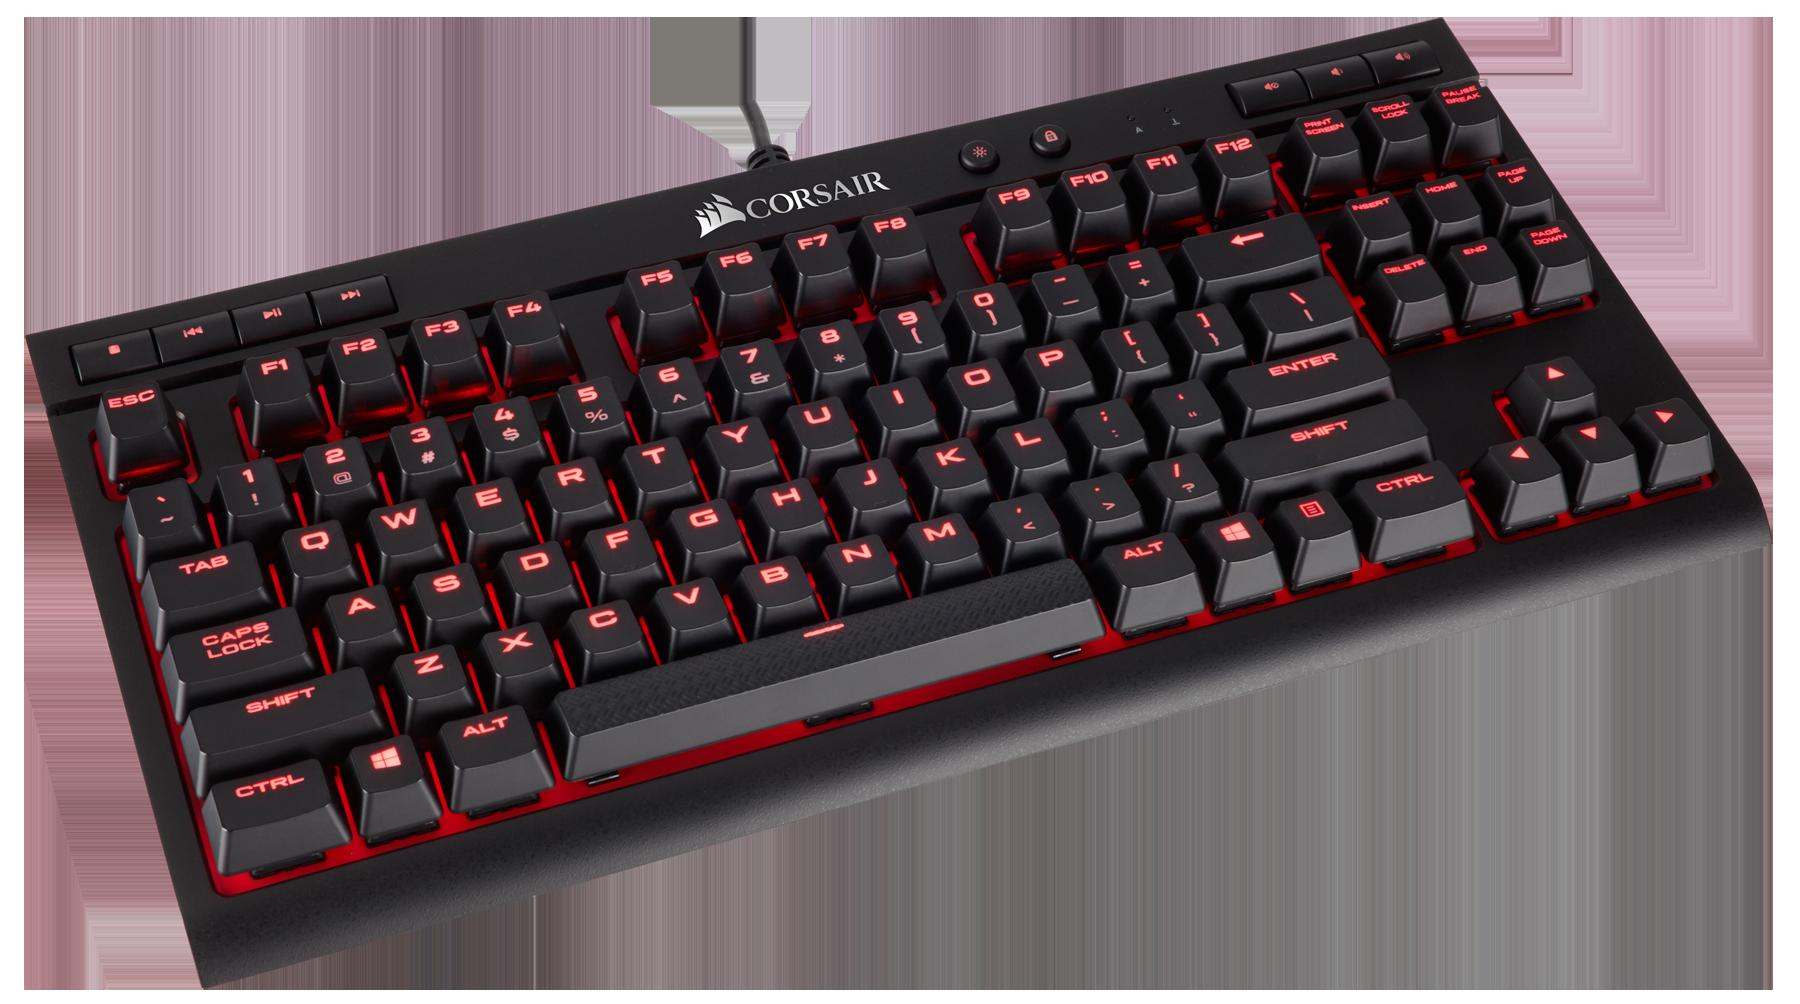 The power of CUE: CORSAIR's New Tenkeyless K63 Mechanical Gaming Keyboard